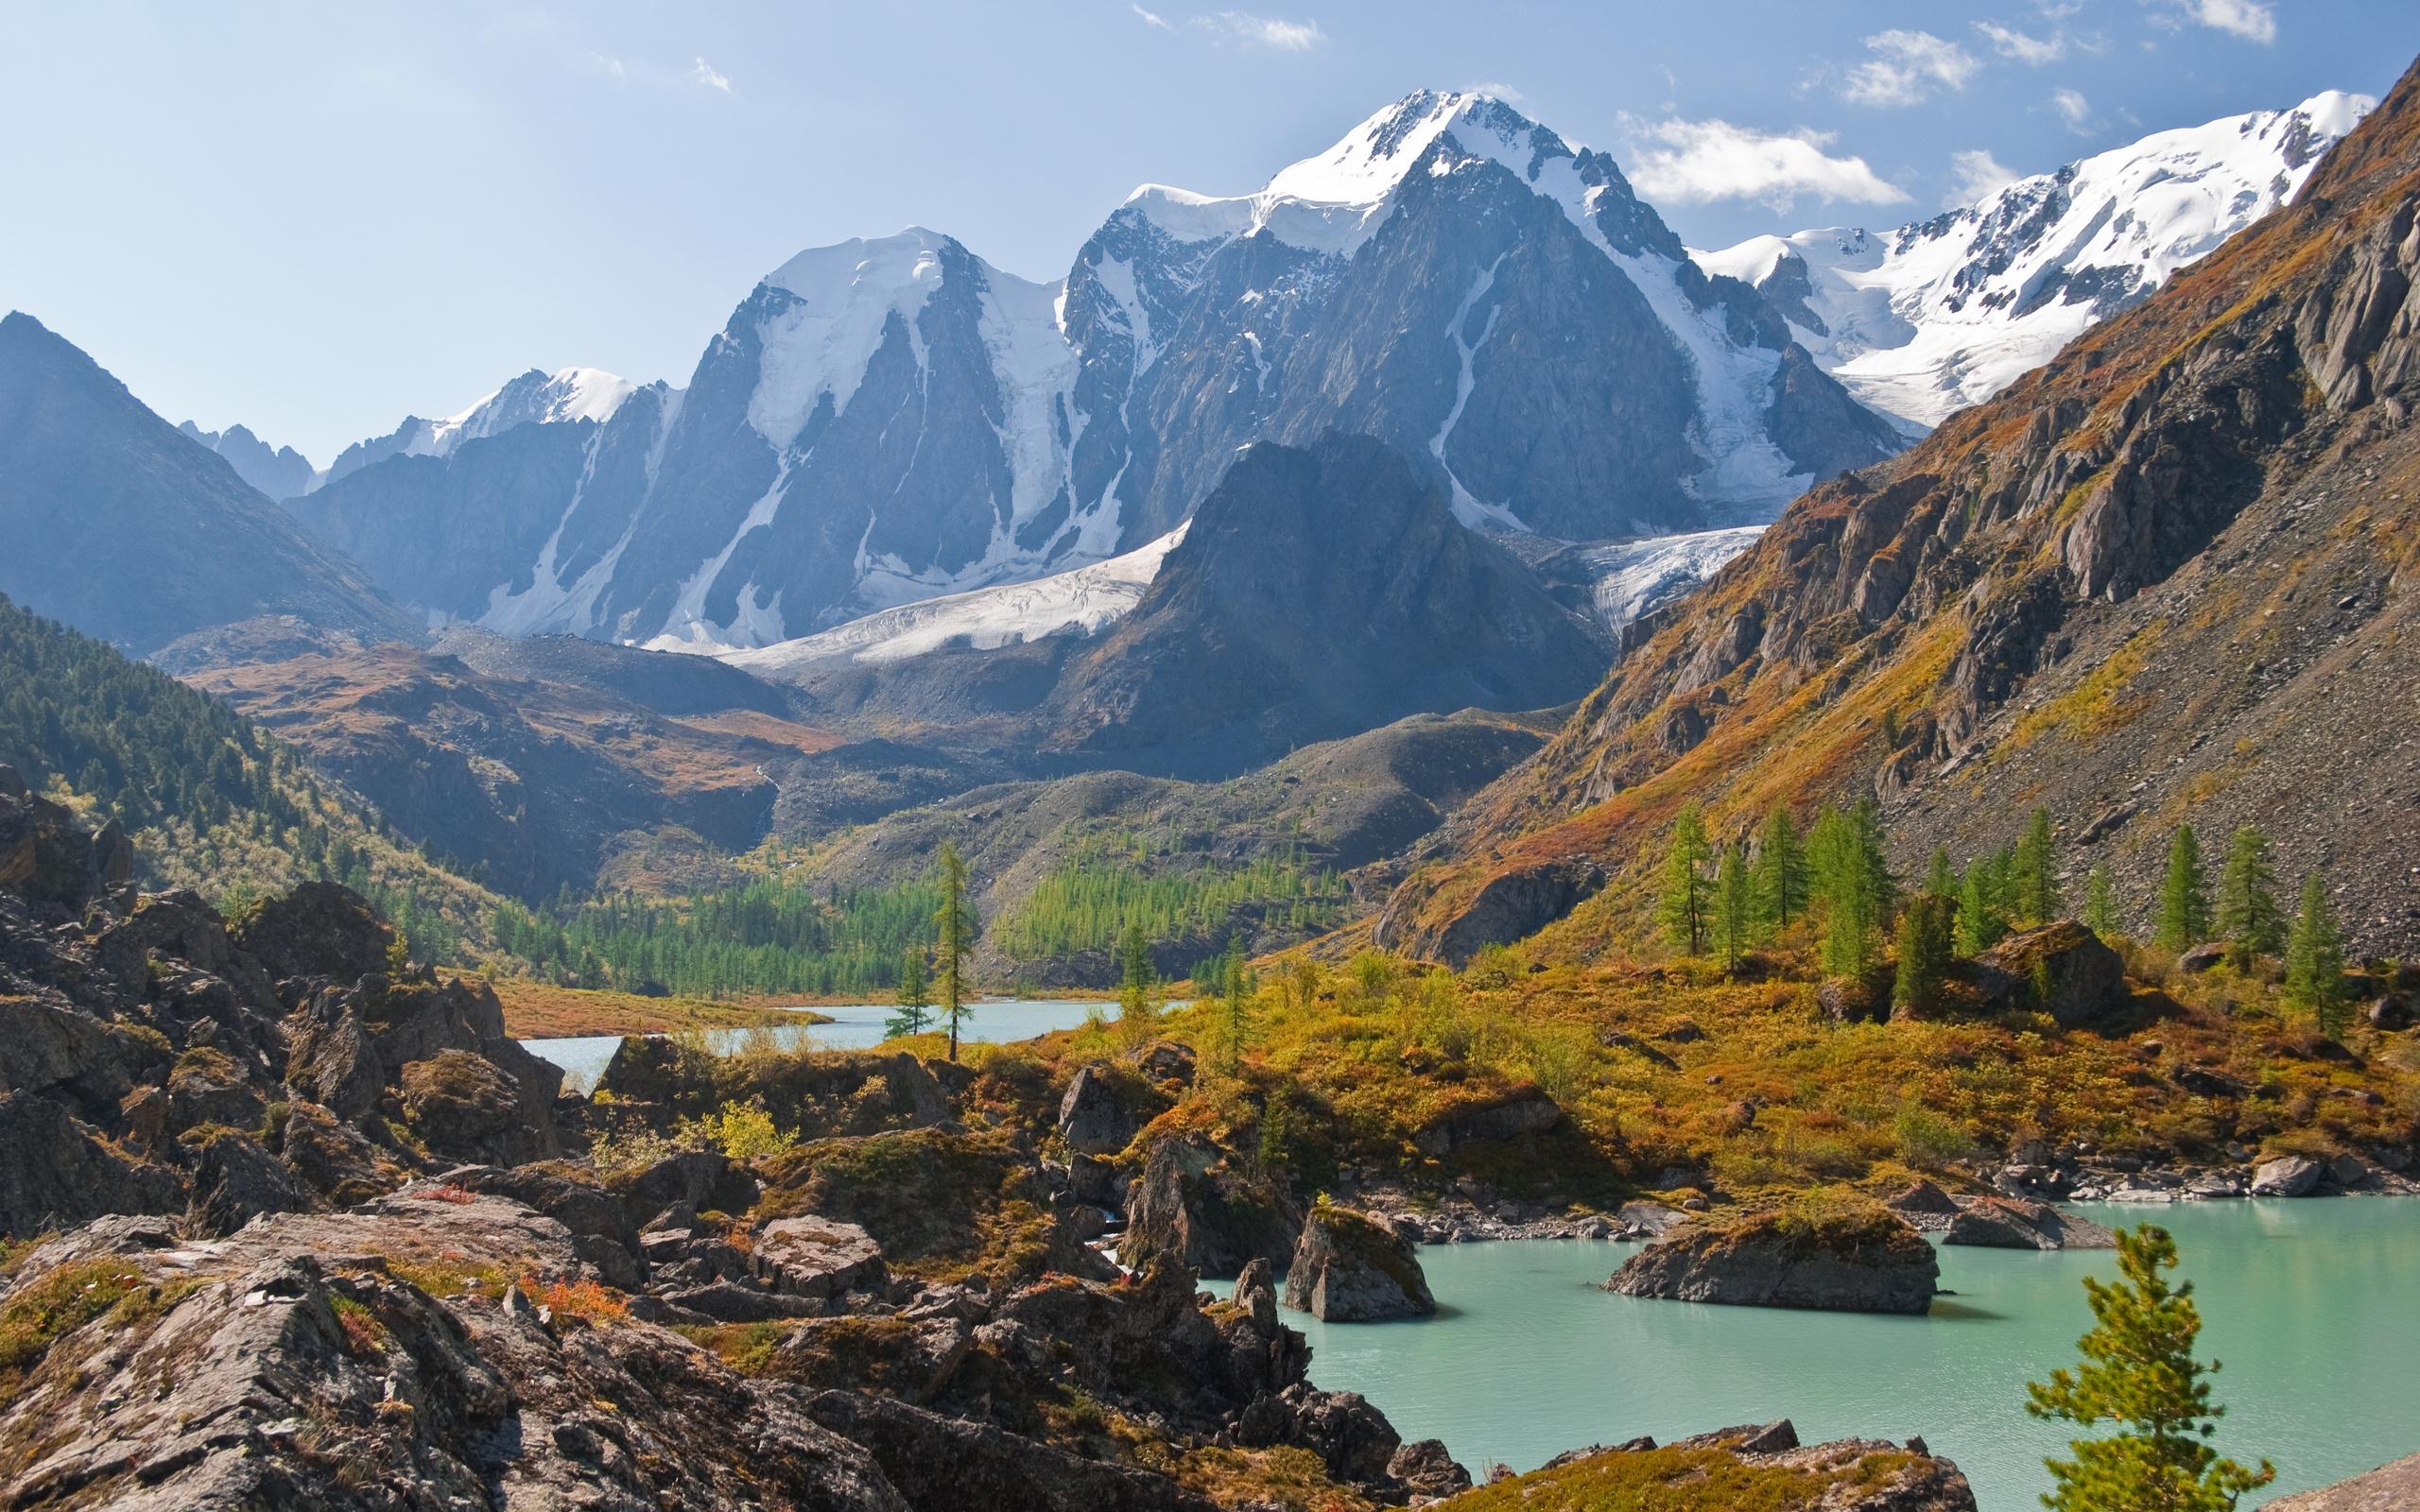 горы, озеро, north-chuyskiy ridge, altai, природа